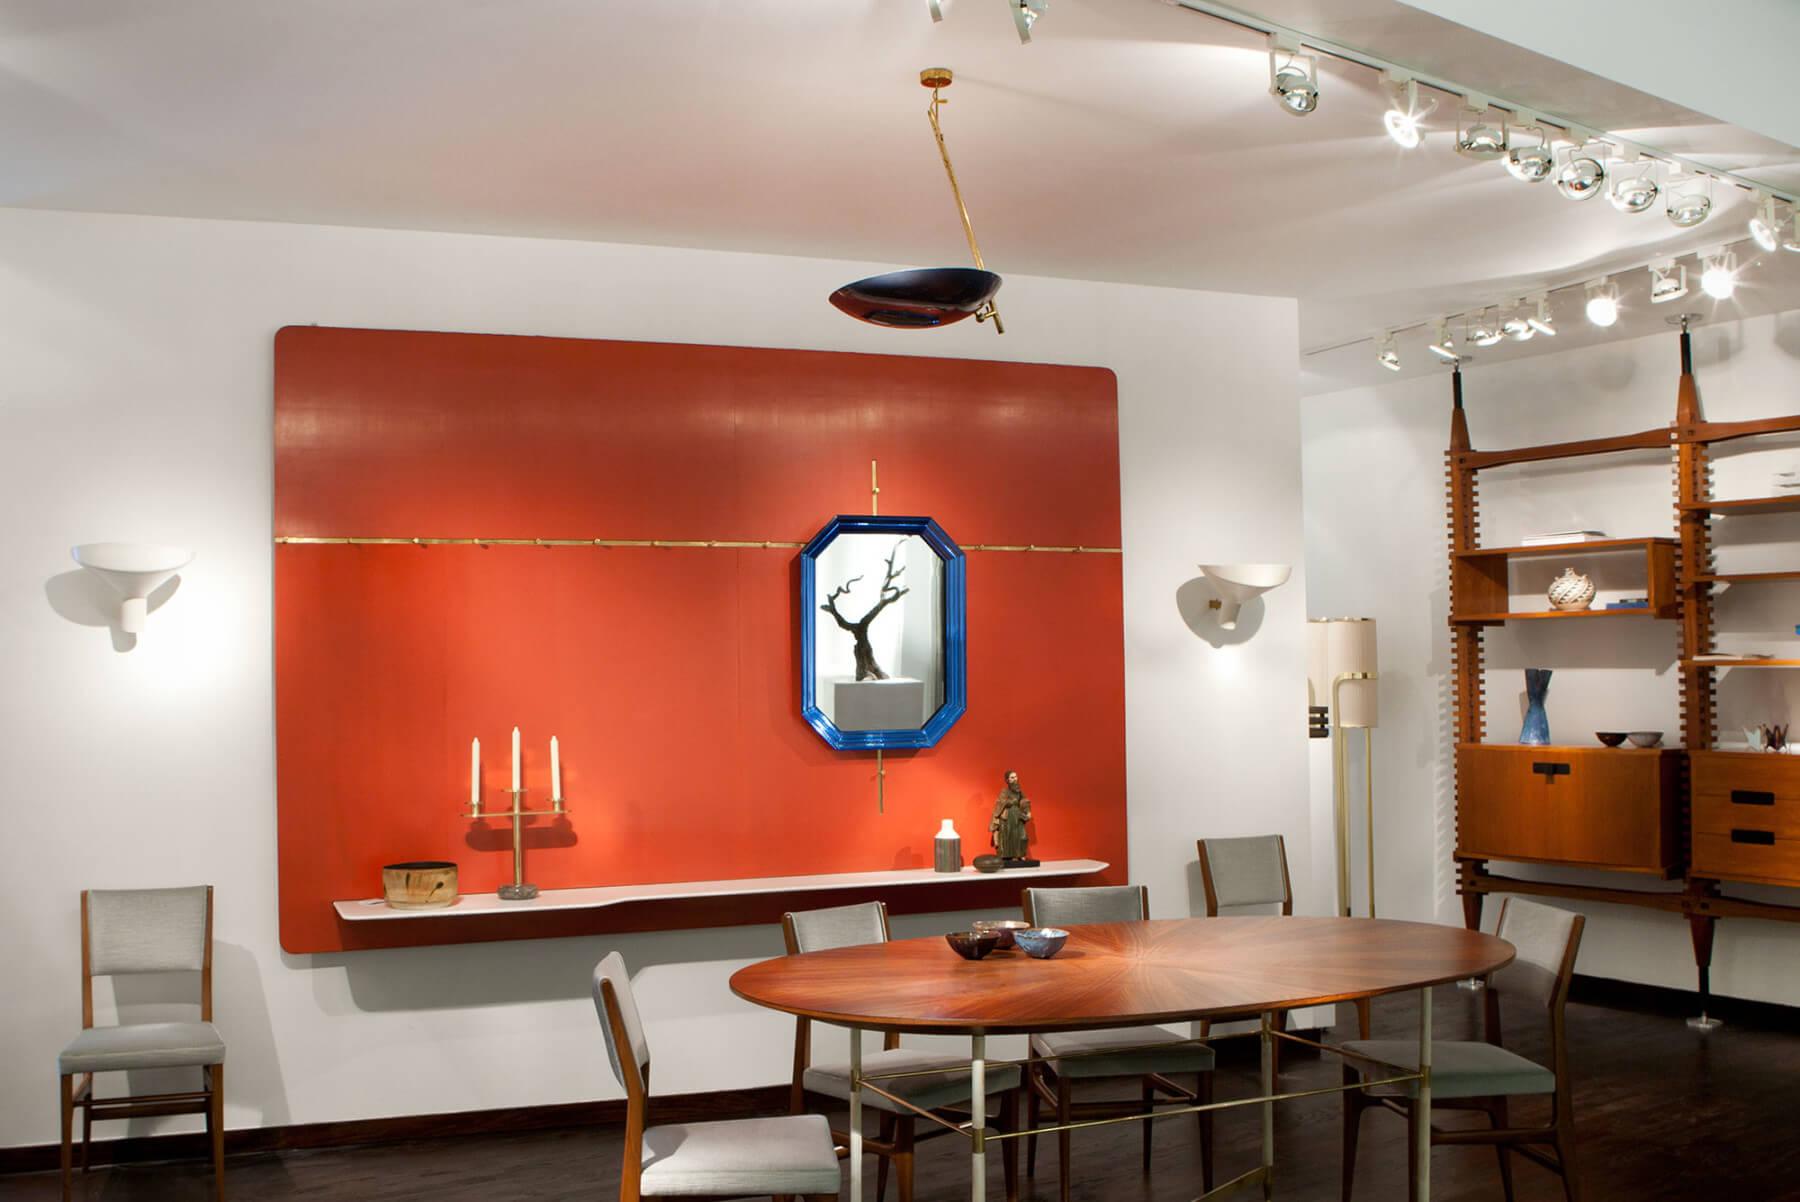 Vittoriano Viganò                                Ceiling light, model 2059